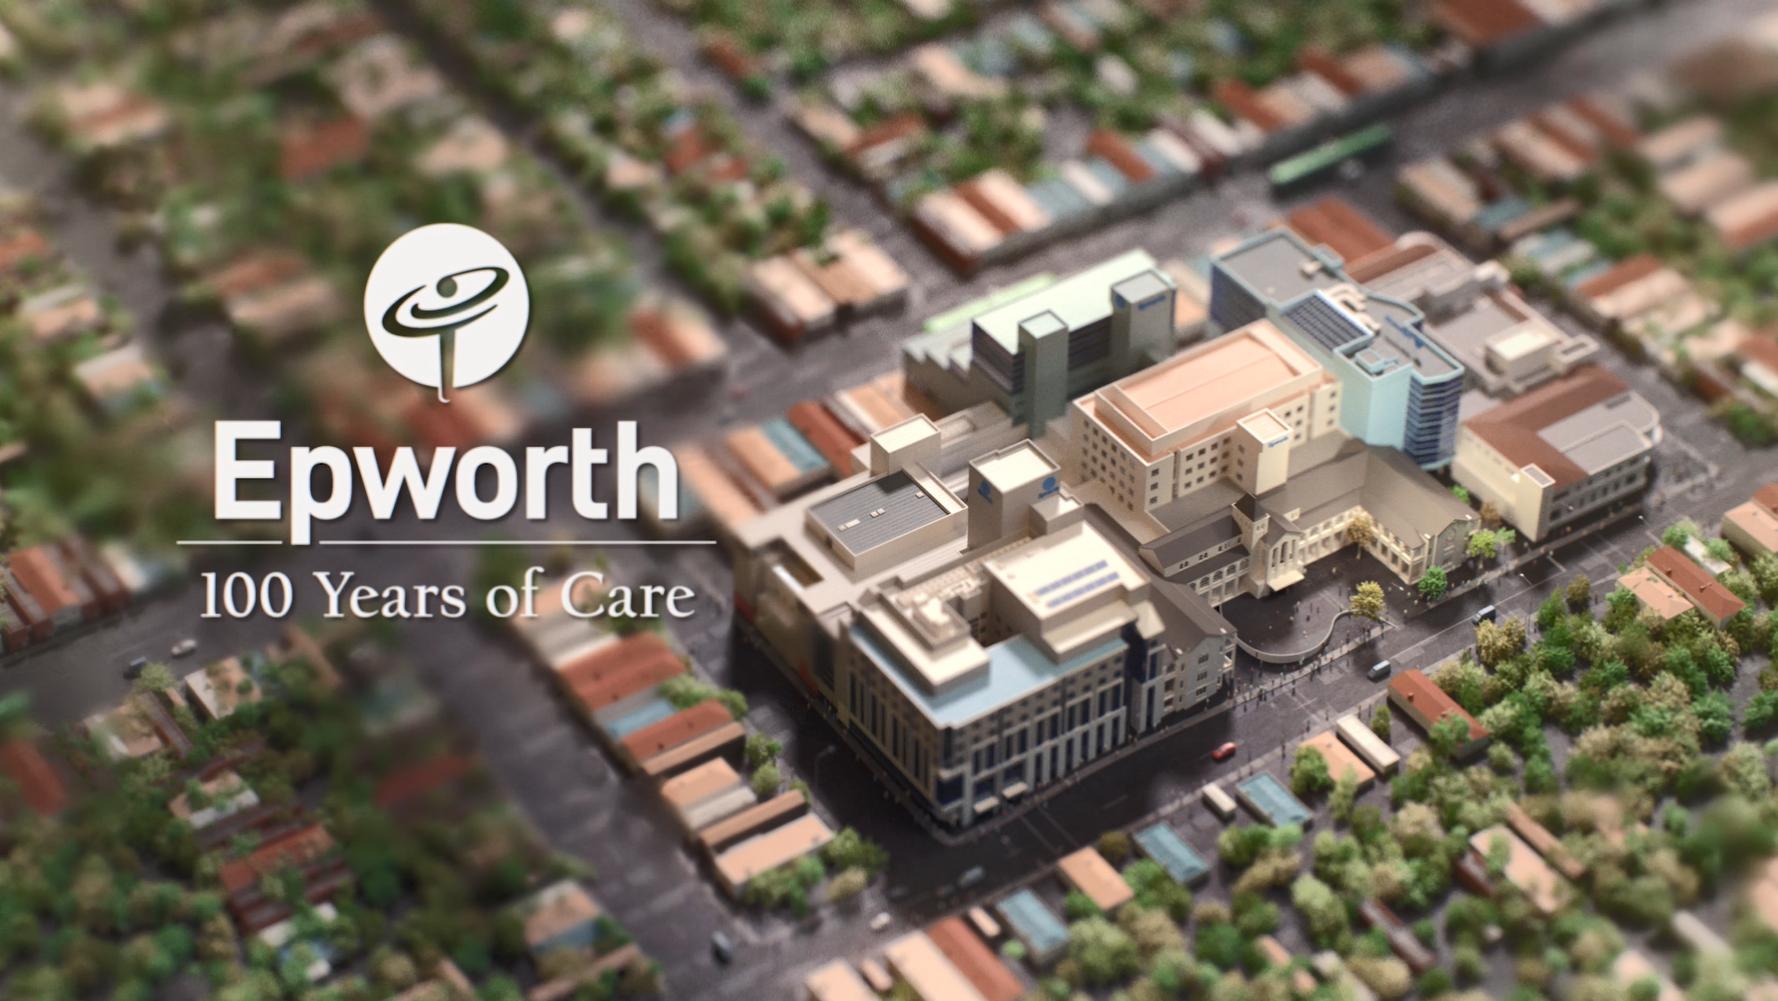 Epworth documentary trailer